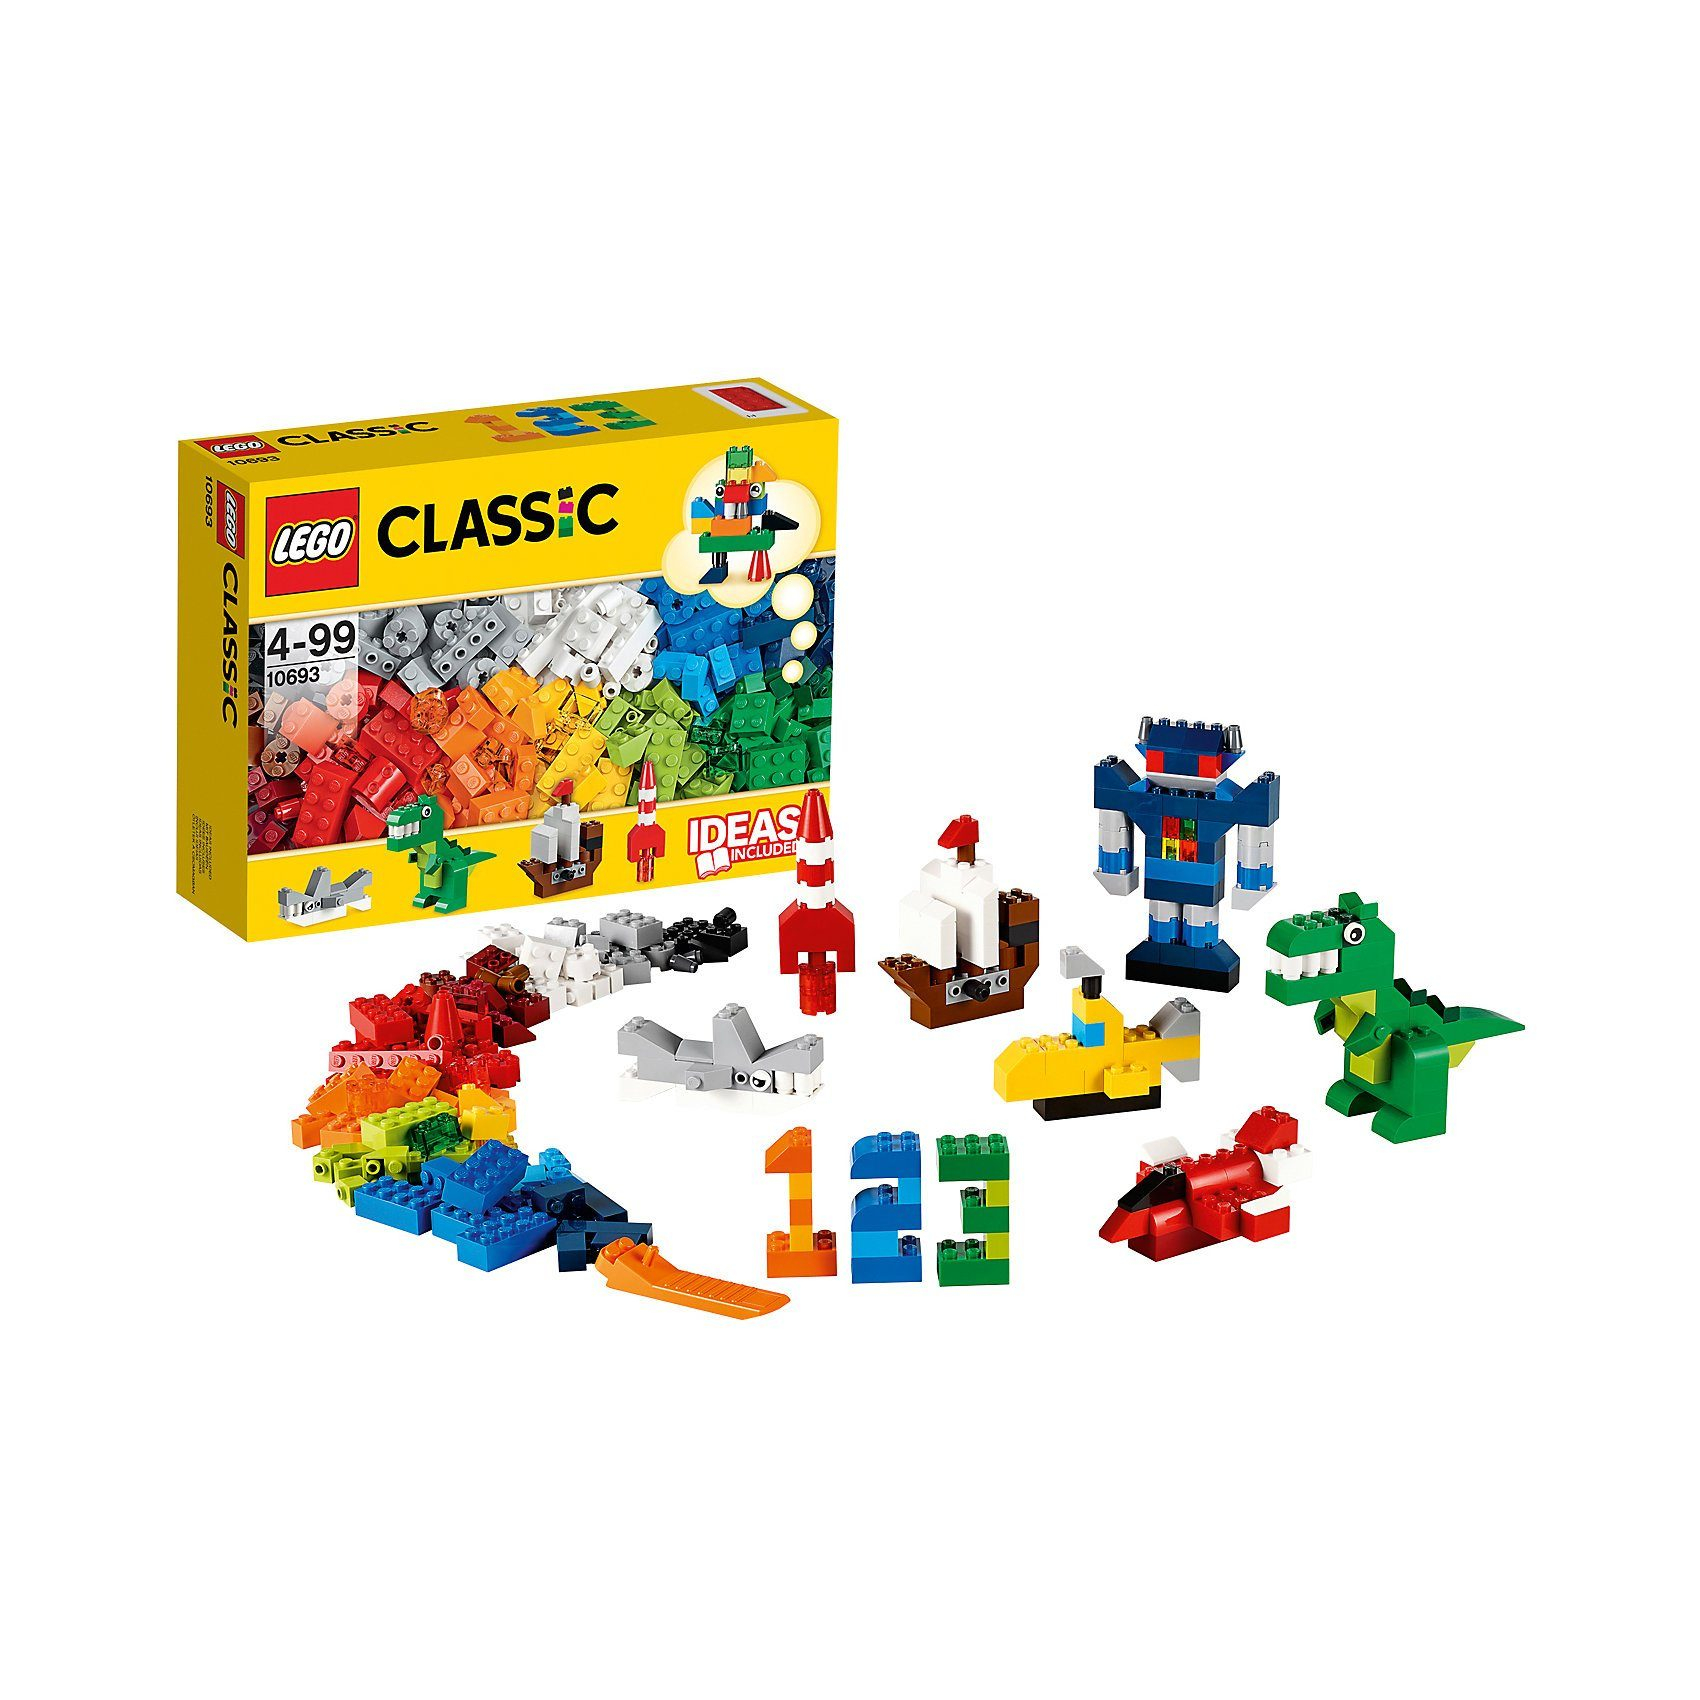 LEGO 10693 Classics: Baustein-Ergänzungsset